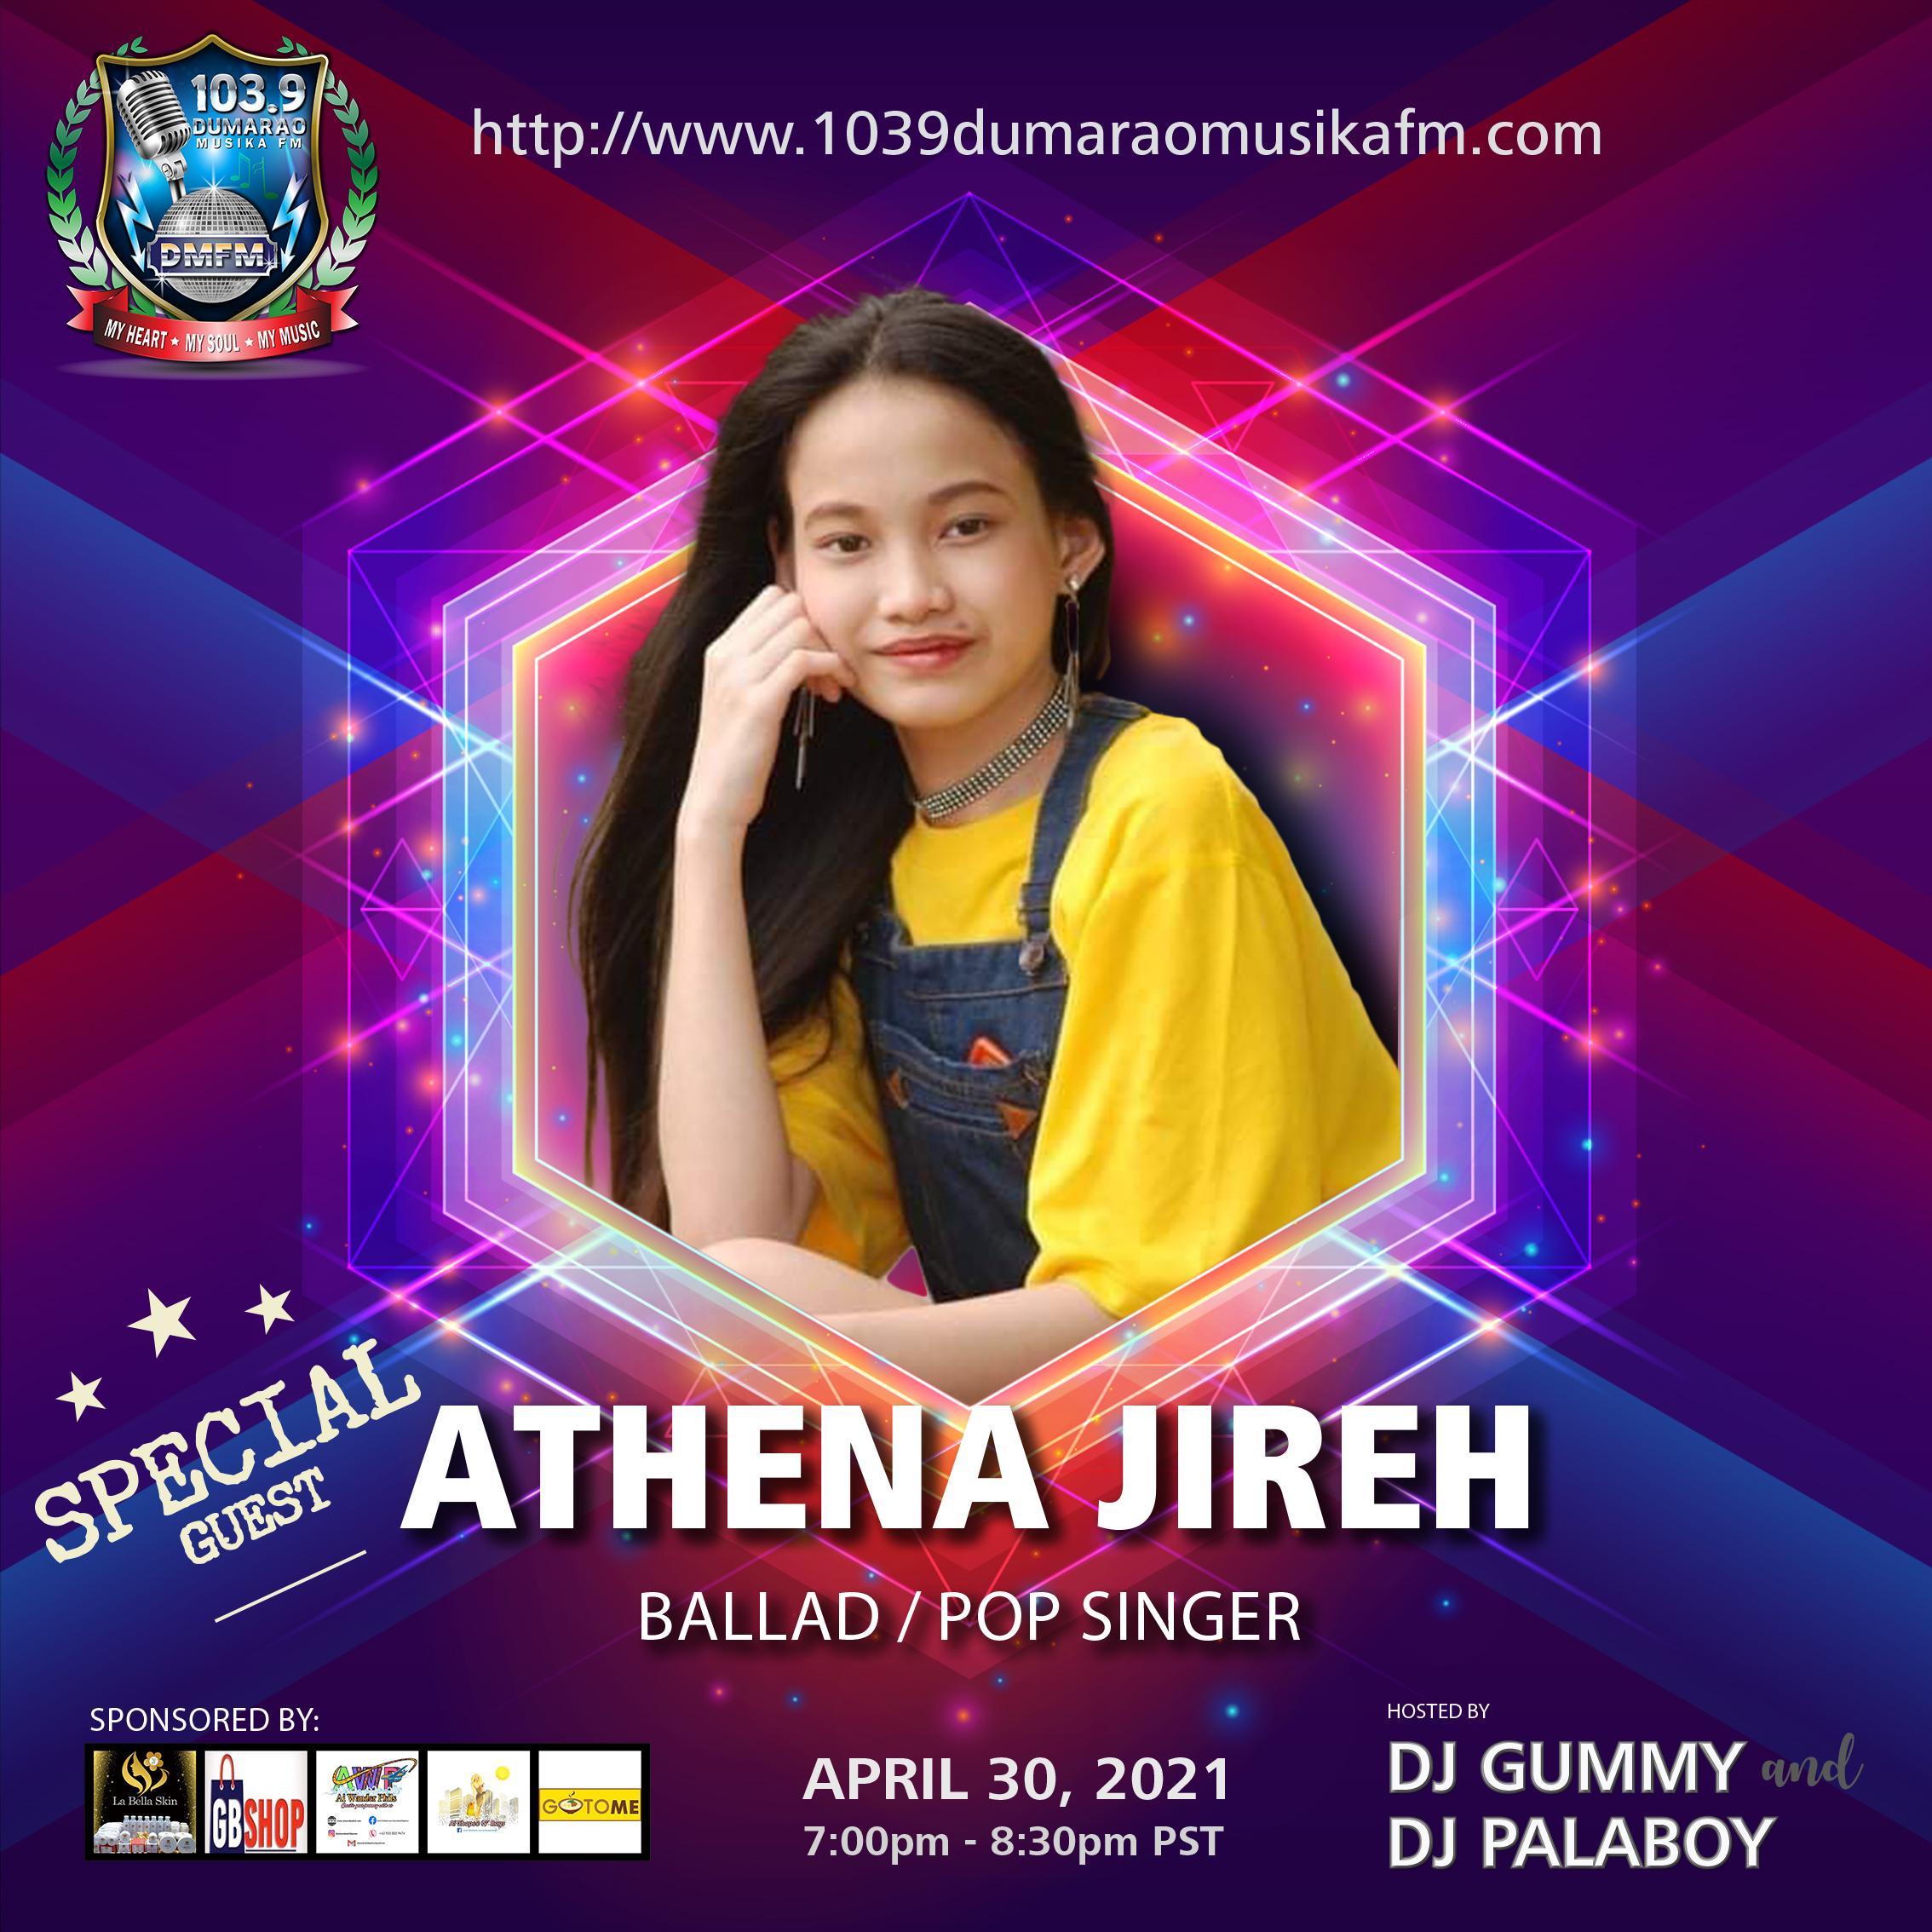 ATHENA-JIREH-banner